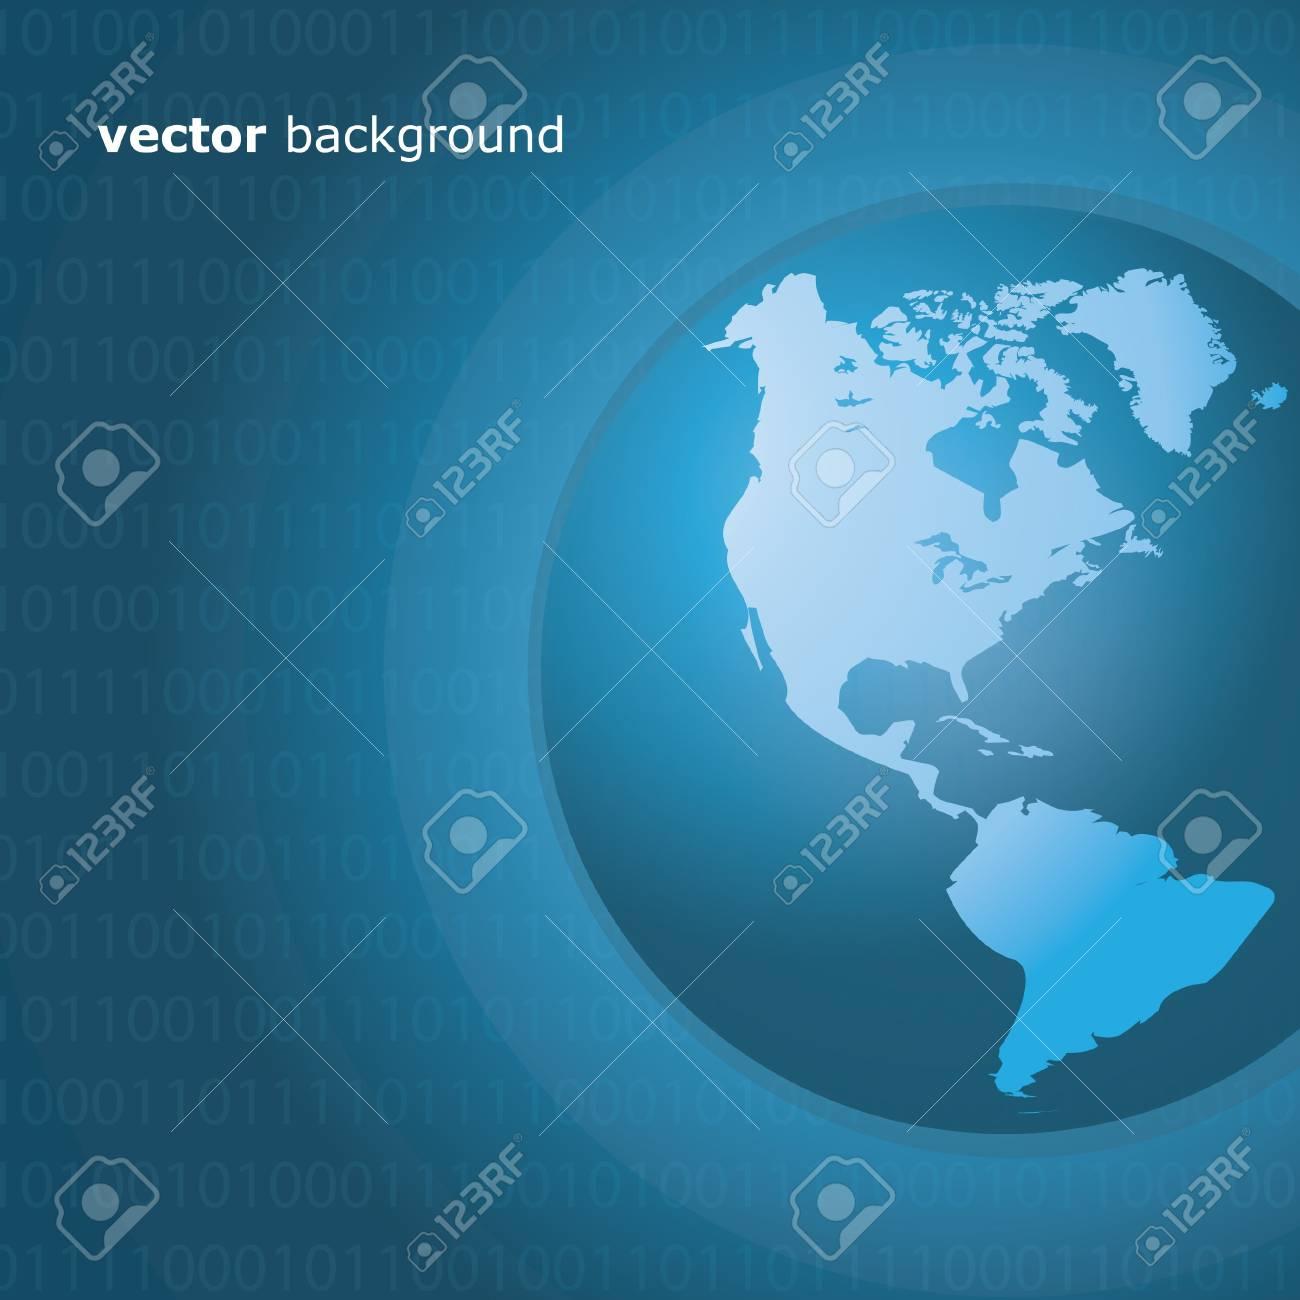 Worldwide Information Background Stock Vector - 11126759